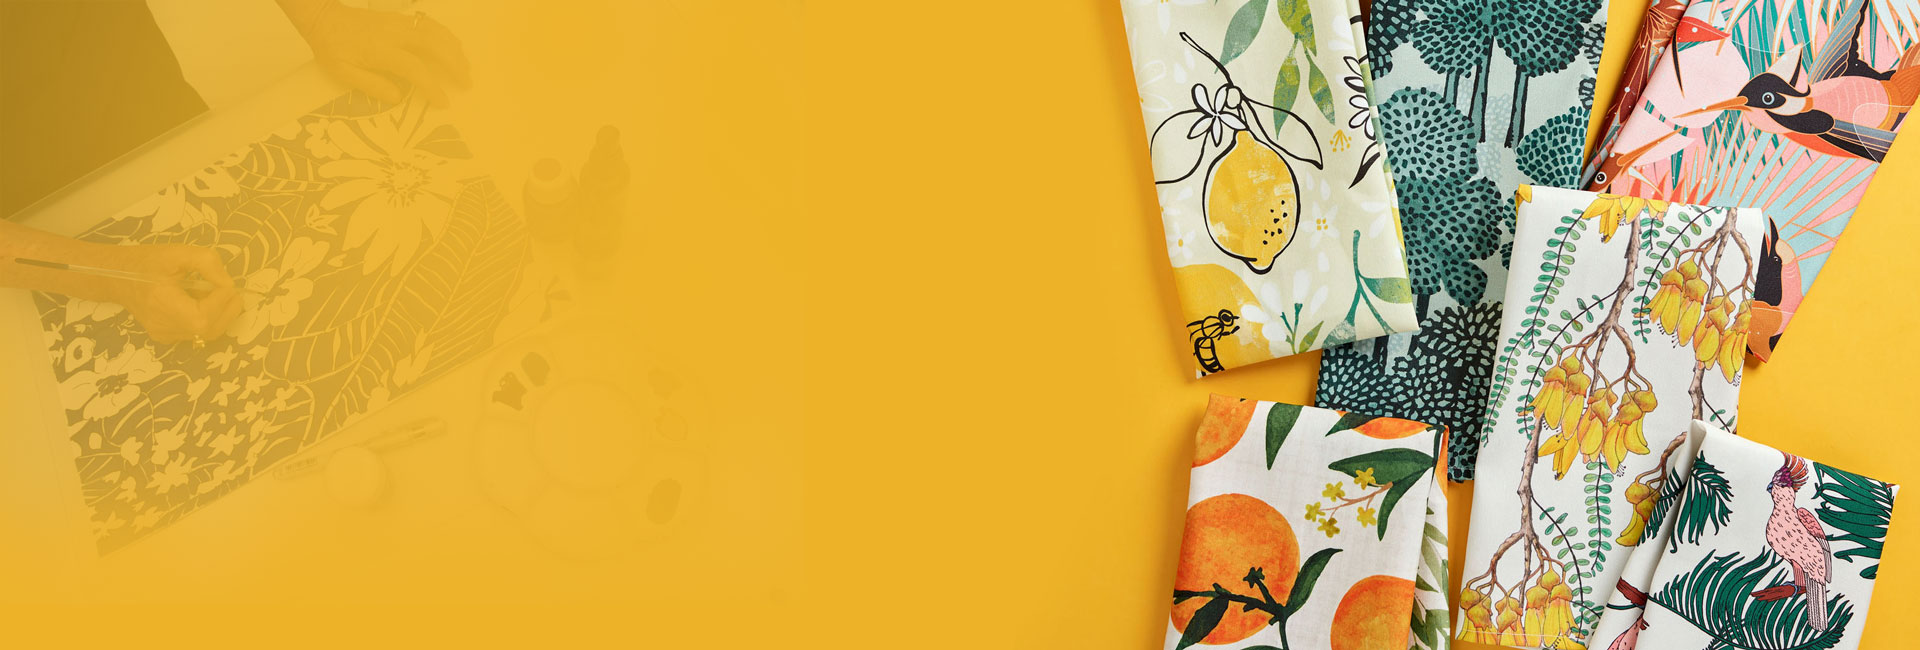 tarahi parche textile illustrator 1 amoozesh pouyaandish - طراحی پارچه